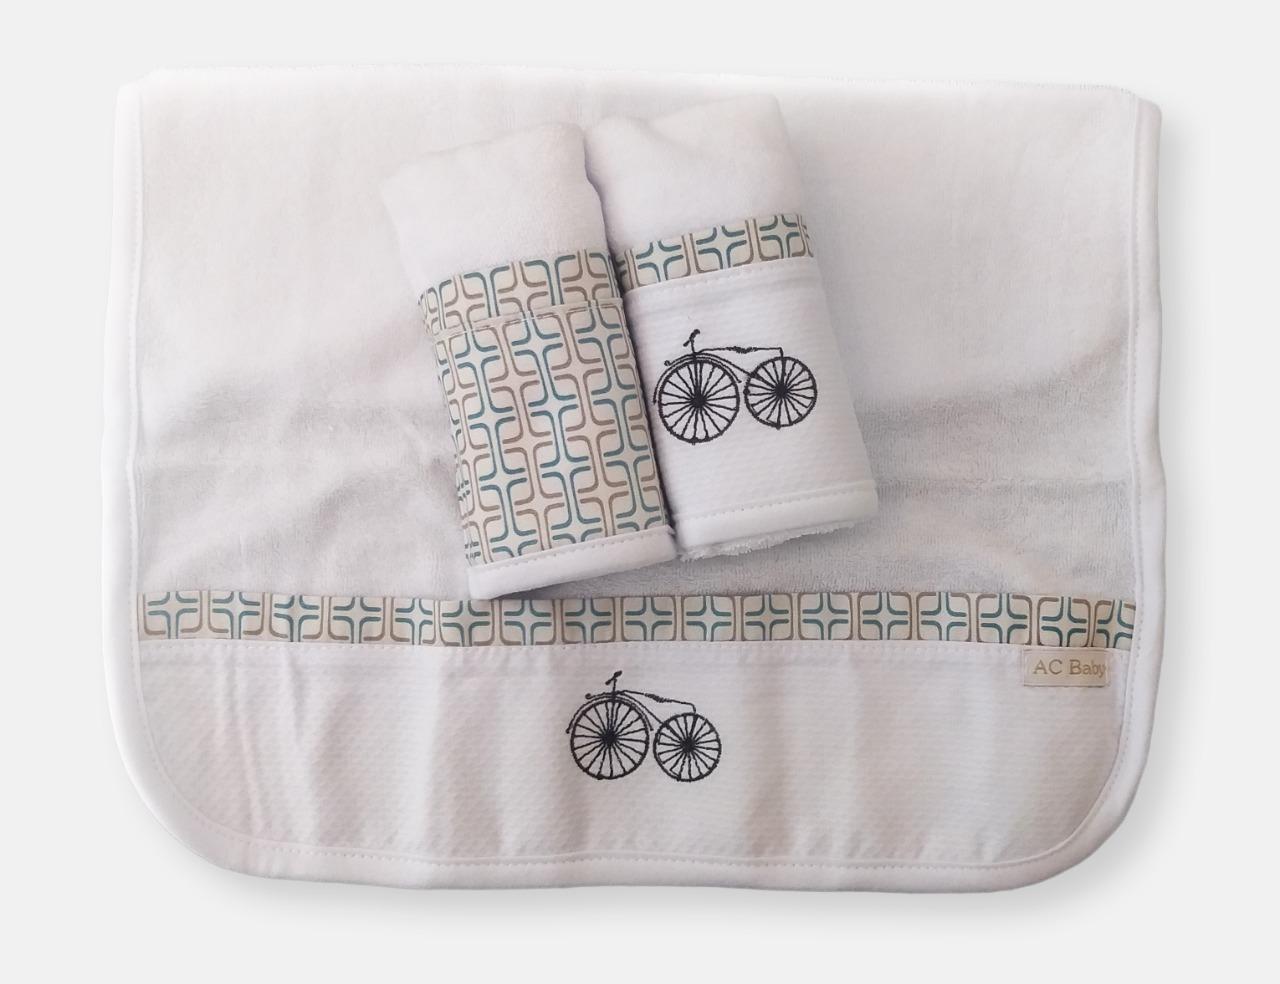 Kit 3 Boquinhas Atoalhado Bici Geometic Exclusivo - Ac Baby Ref 04127 49 U